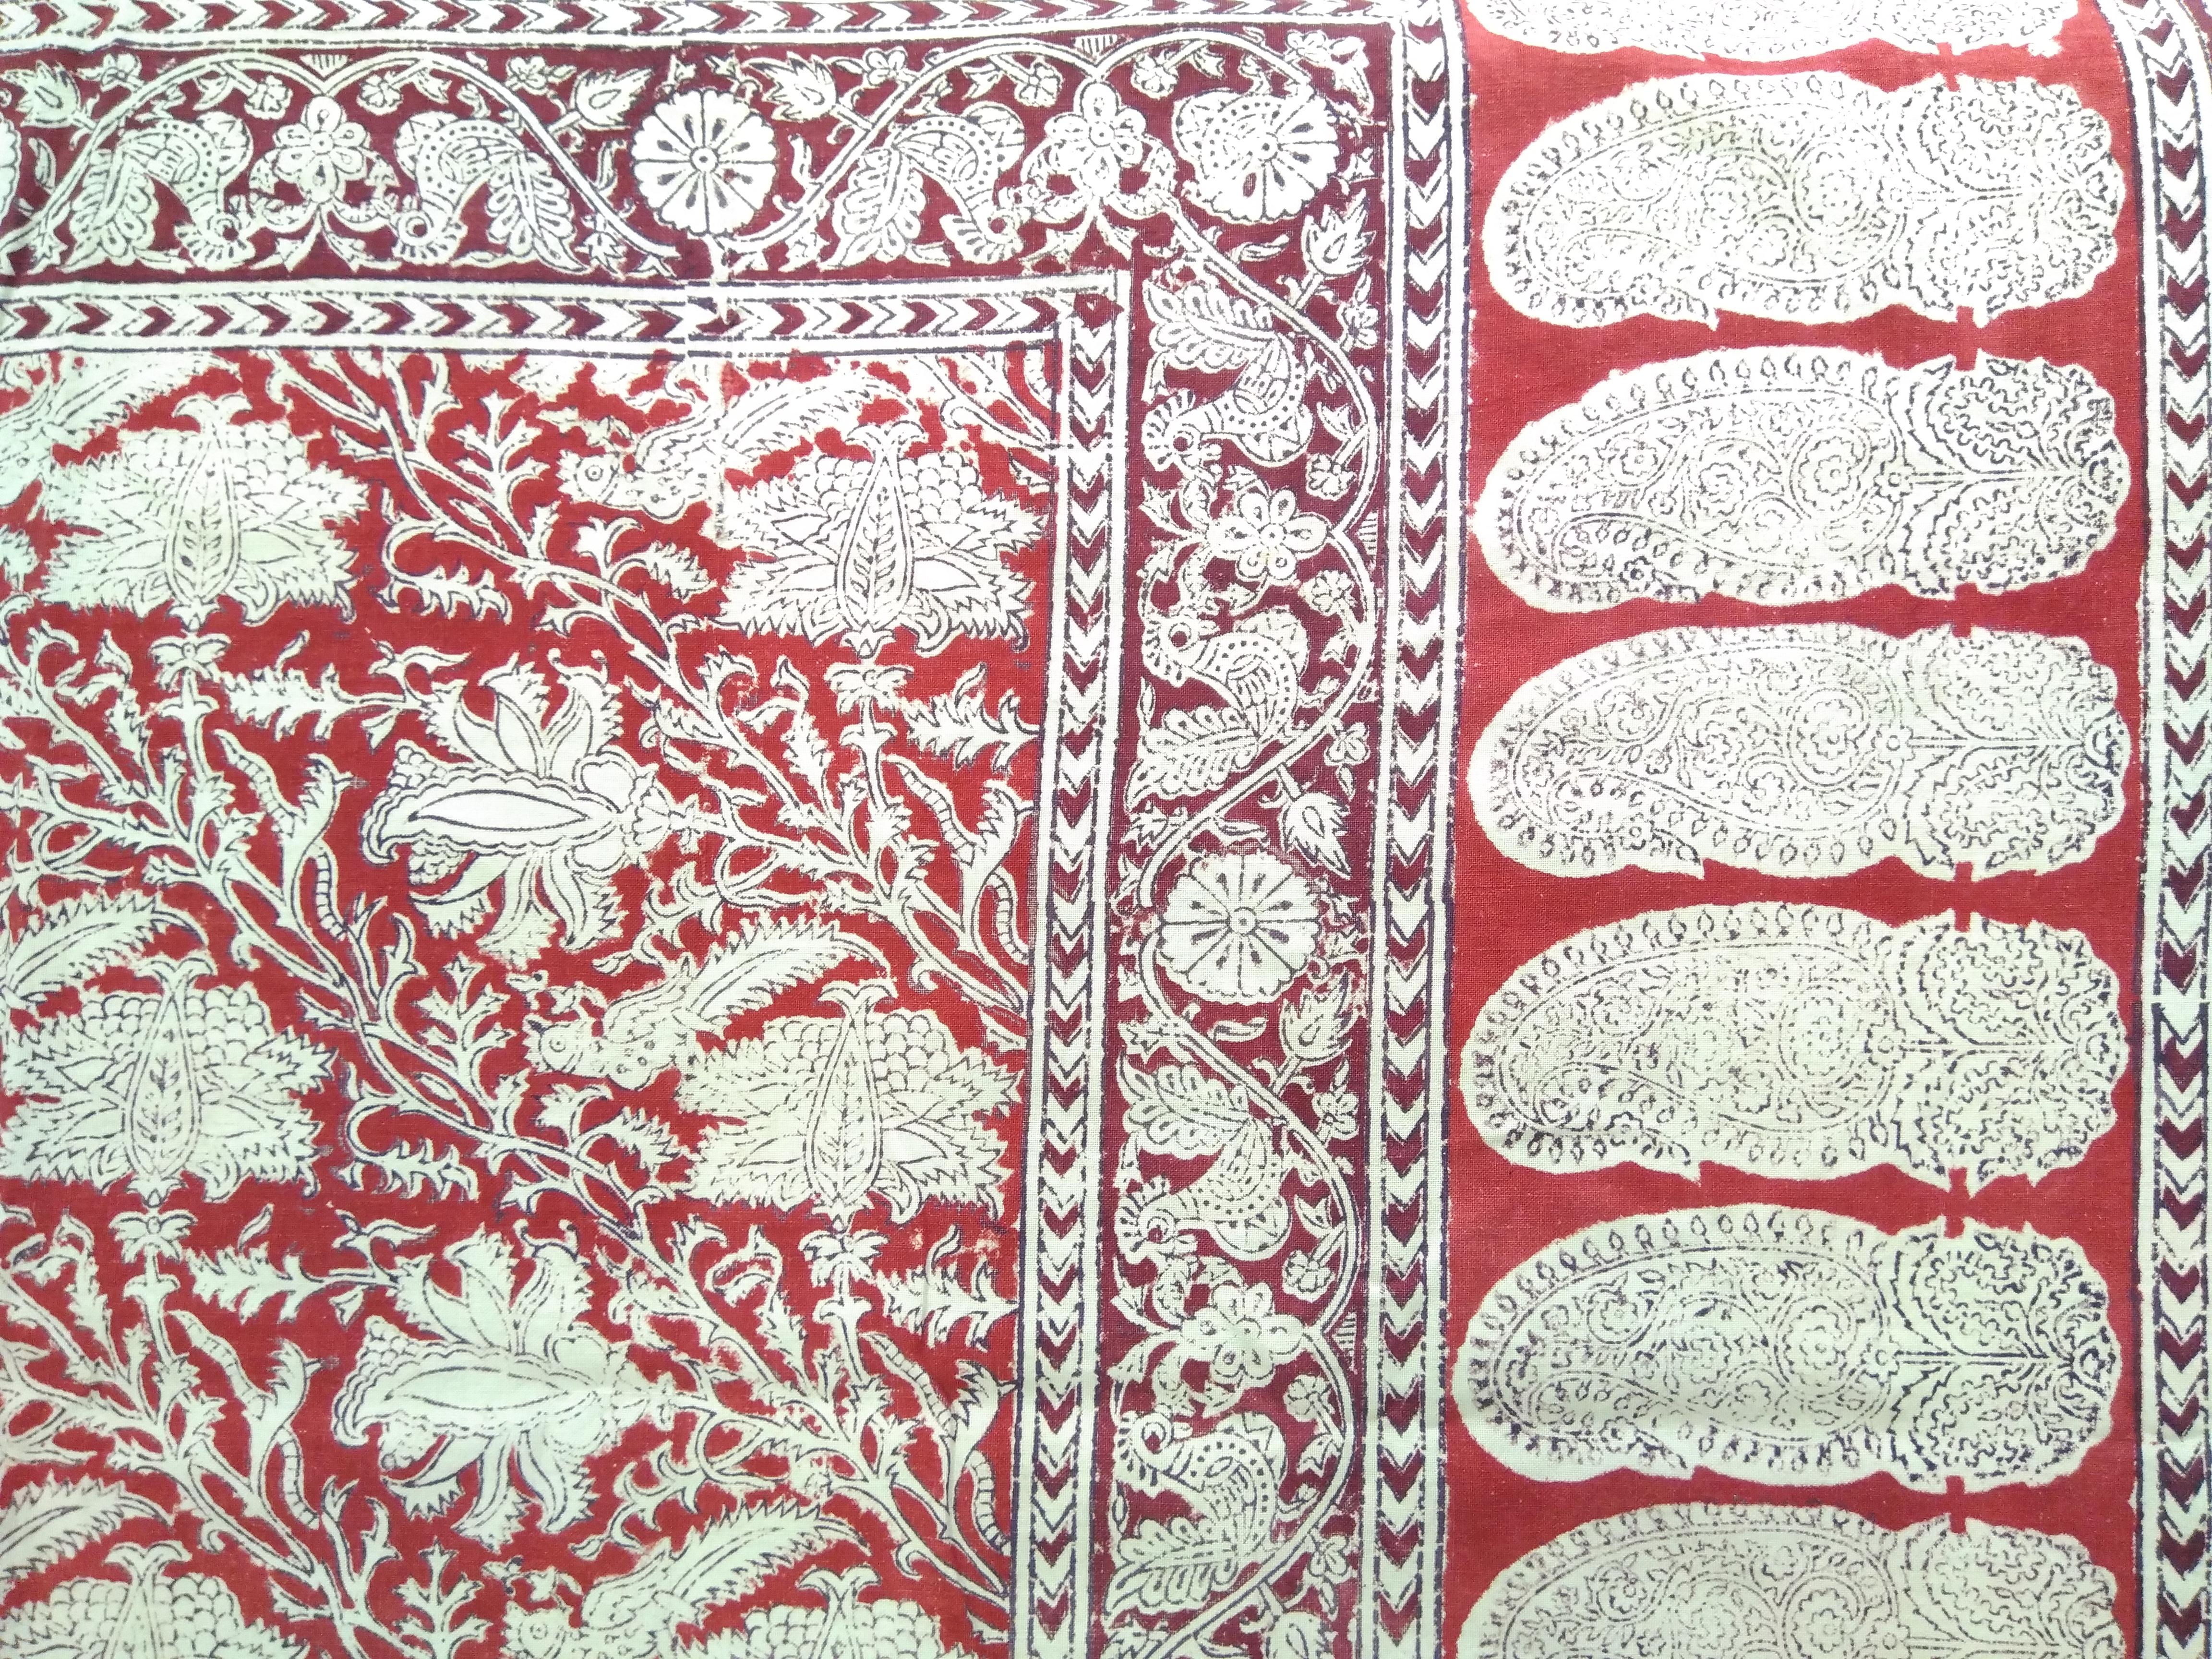 Chandani (Canopy), block print, 20th century, Lt. 226; Wd. 127 cm, probably Ahmedabad, Gujarat. Courtesy: Sushmit.